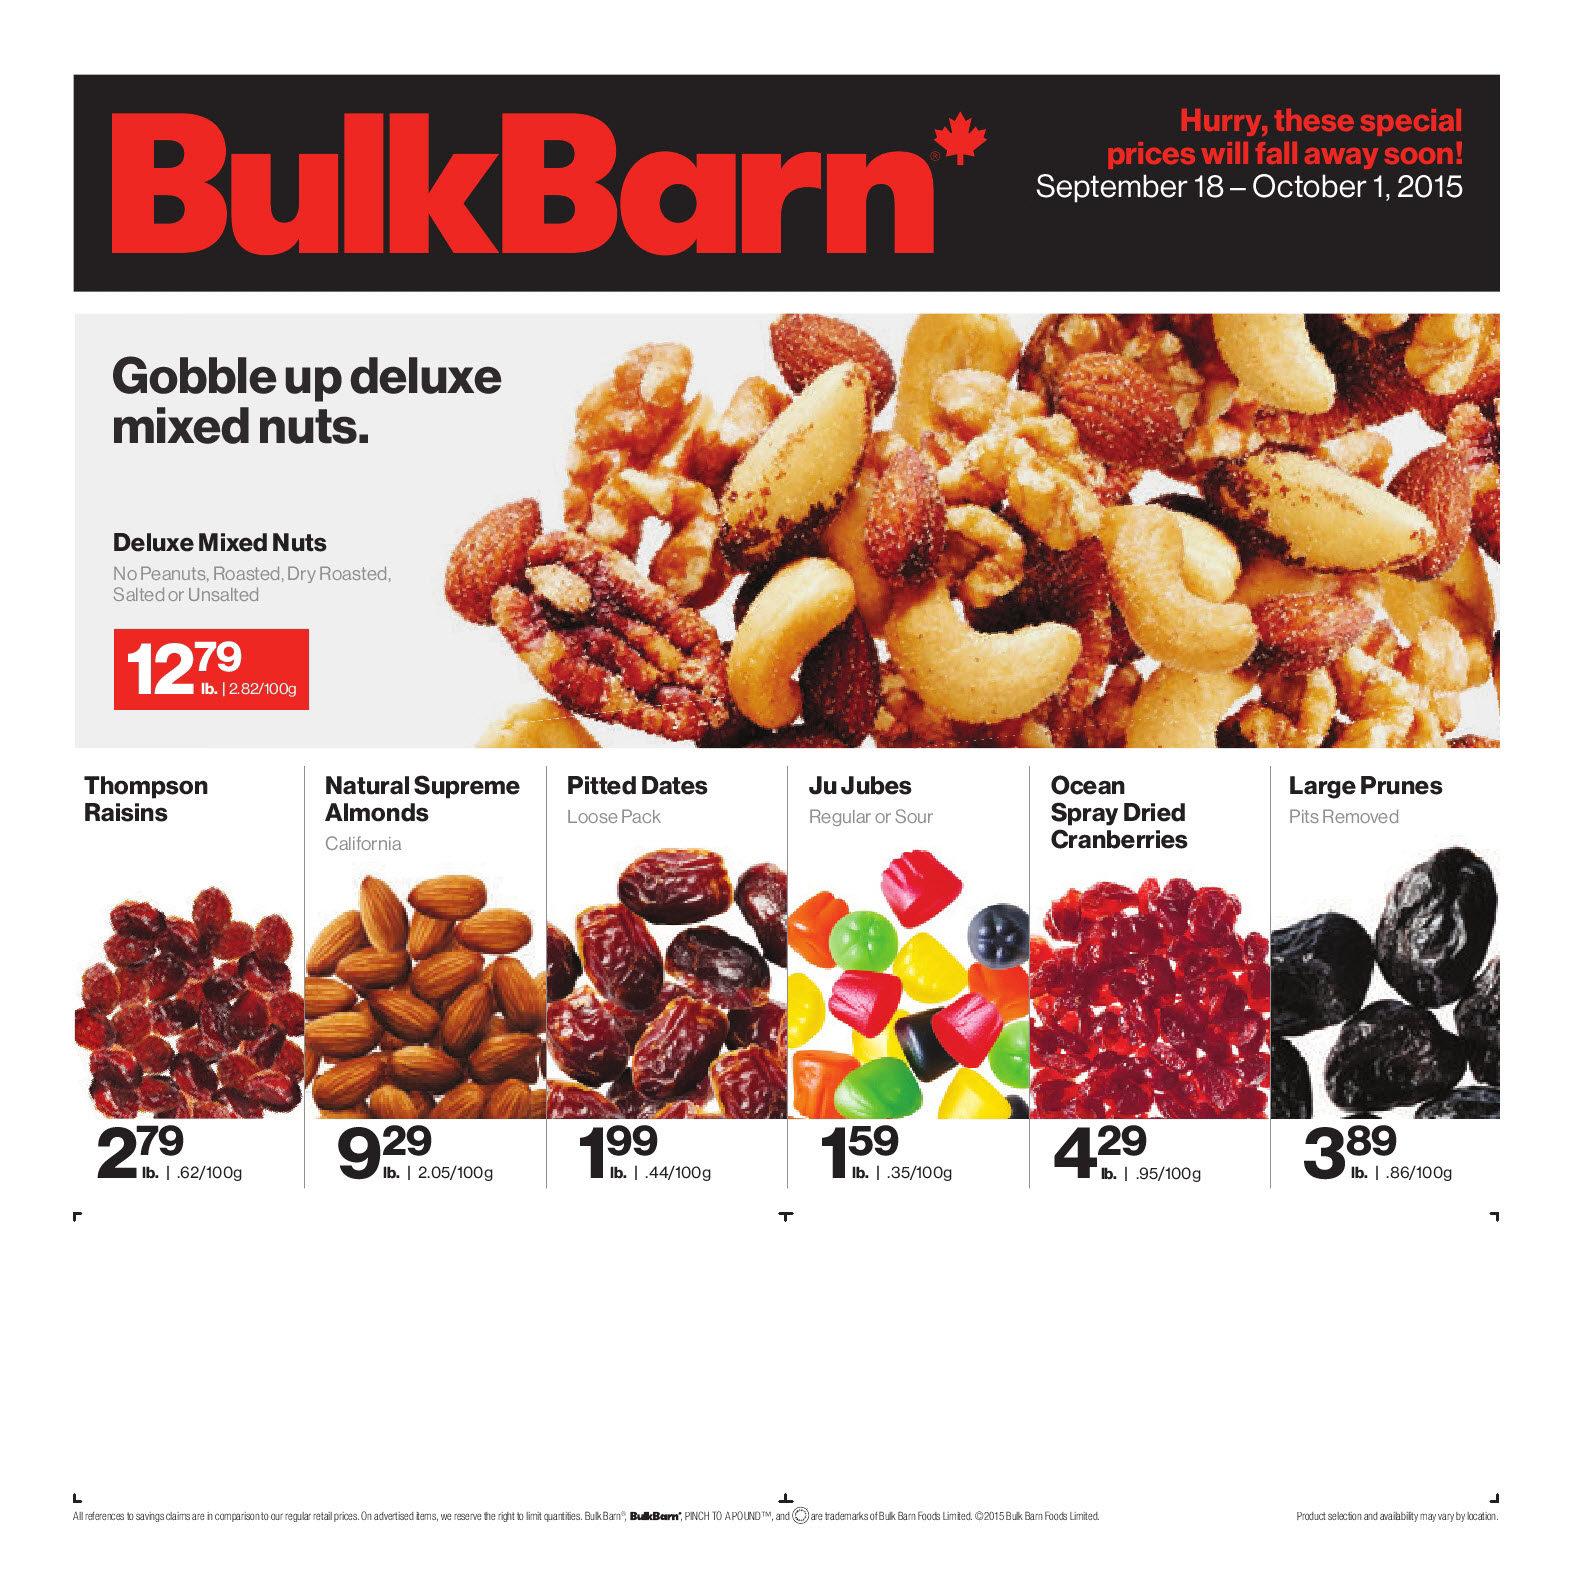 bulk barn weekly flyer 2 week sale sep 18 \u2013 oct 1 redflagdeals com